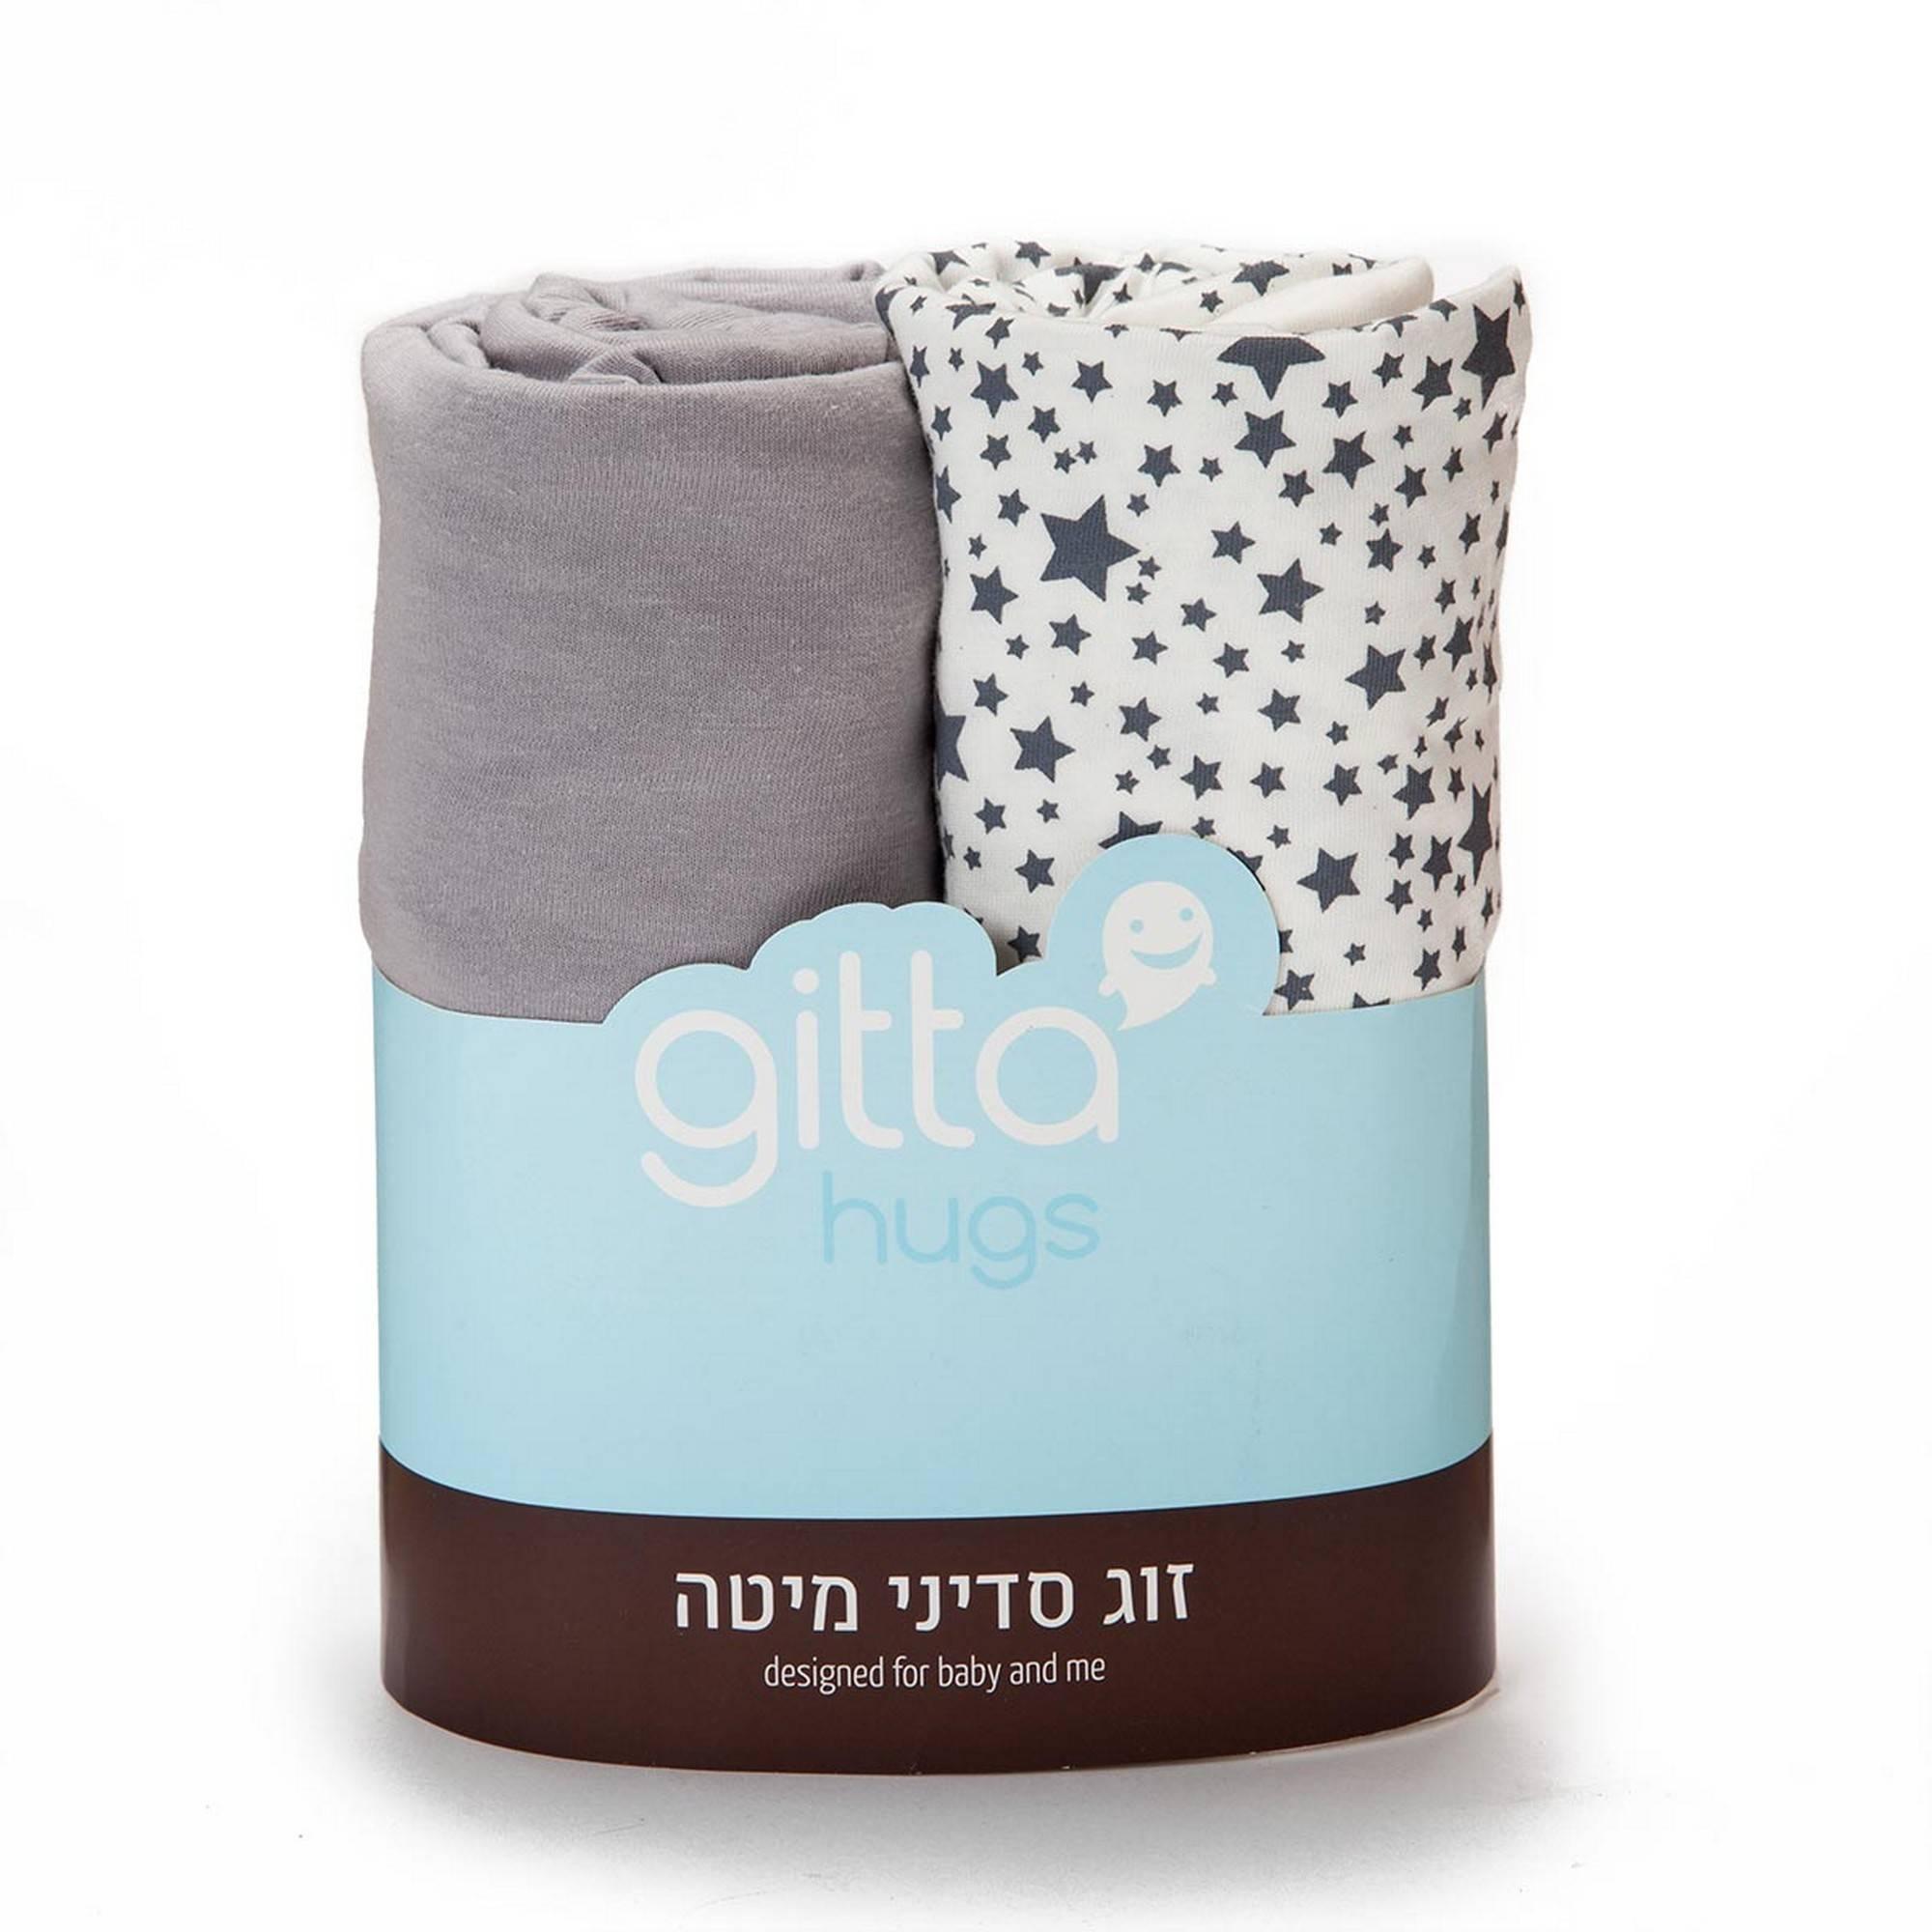 GITTA Cot Sheets - Grey Stars